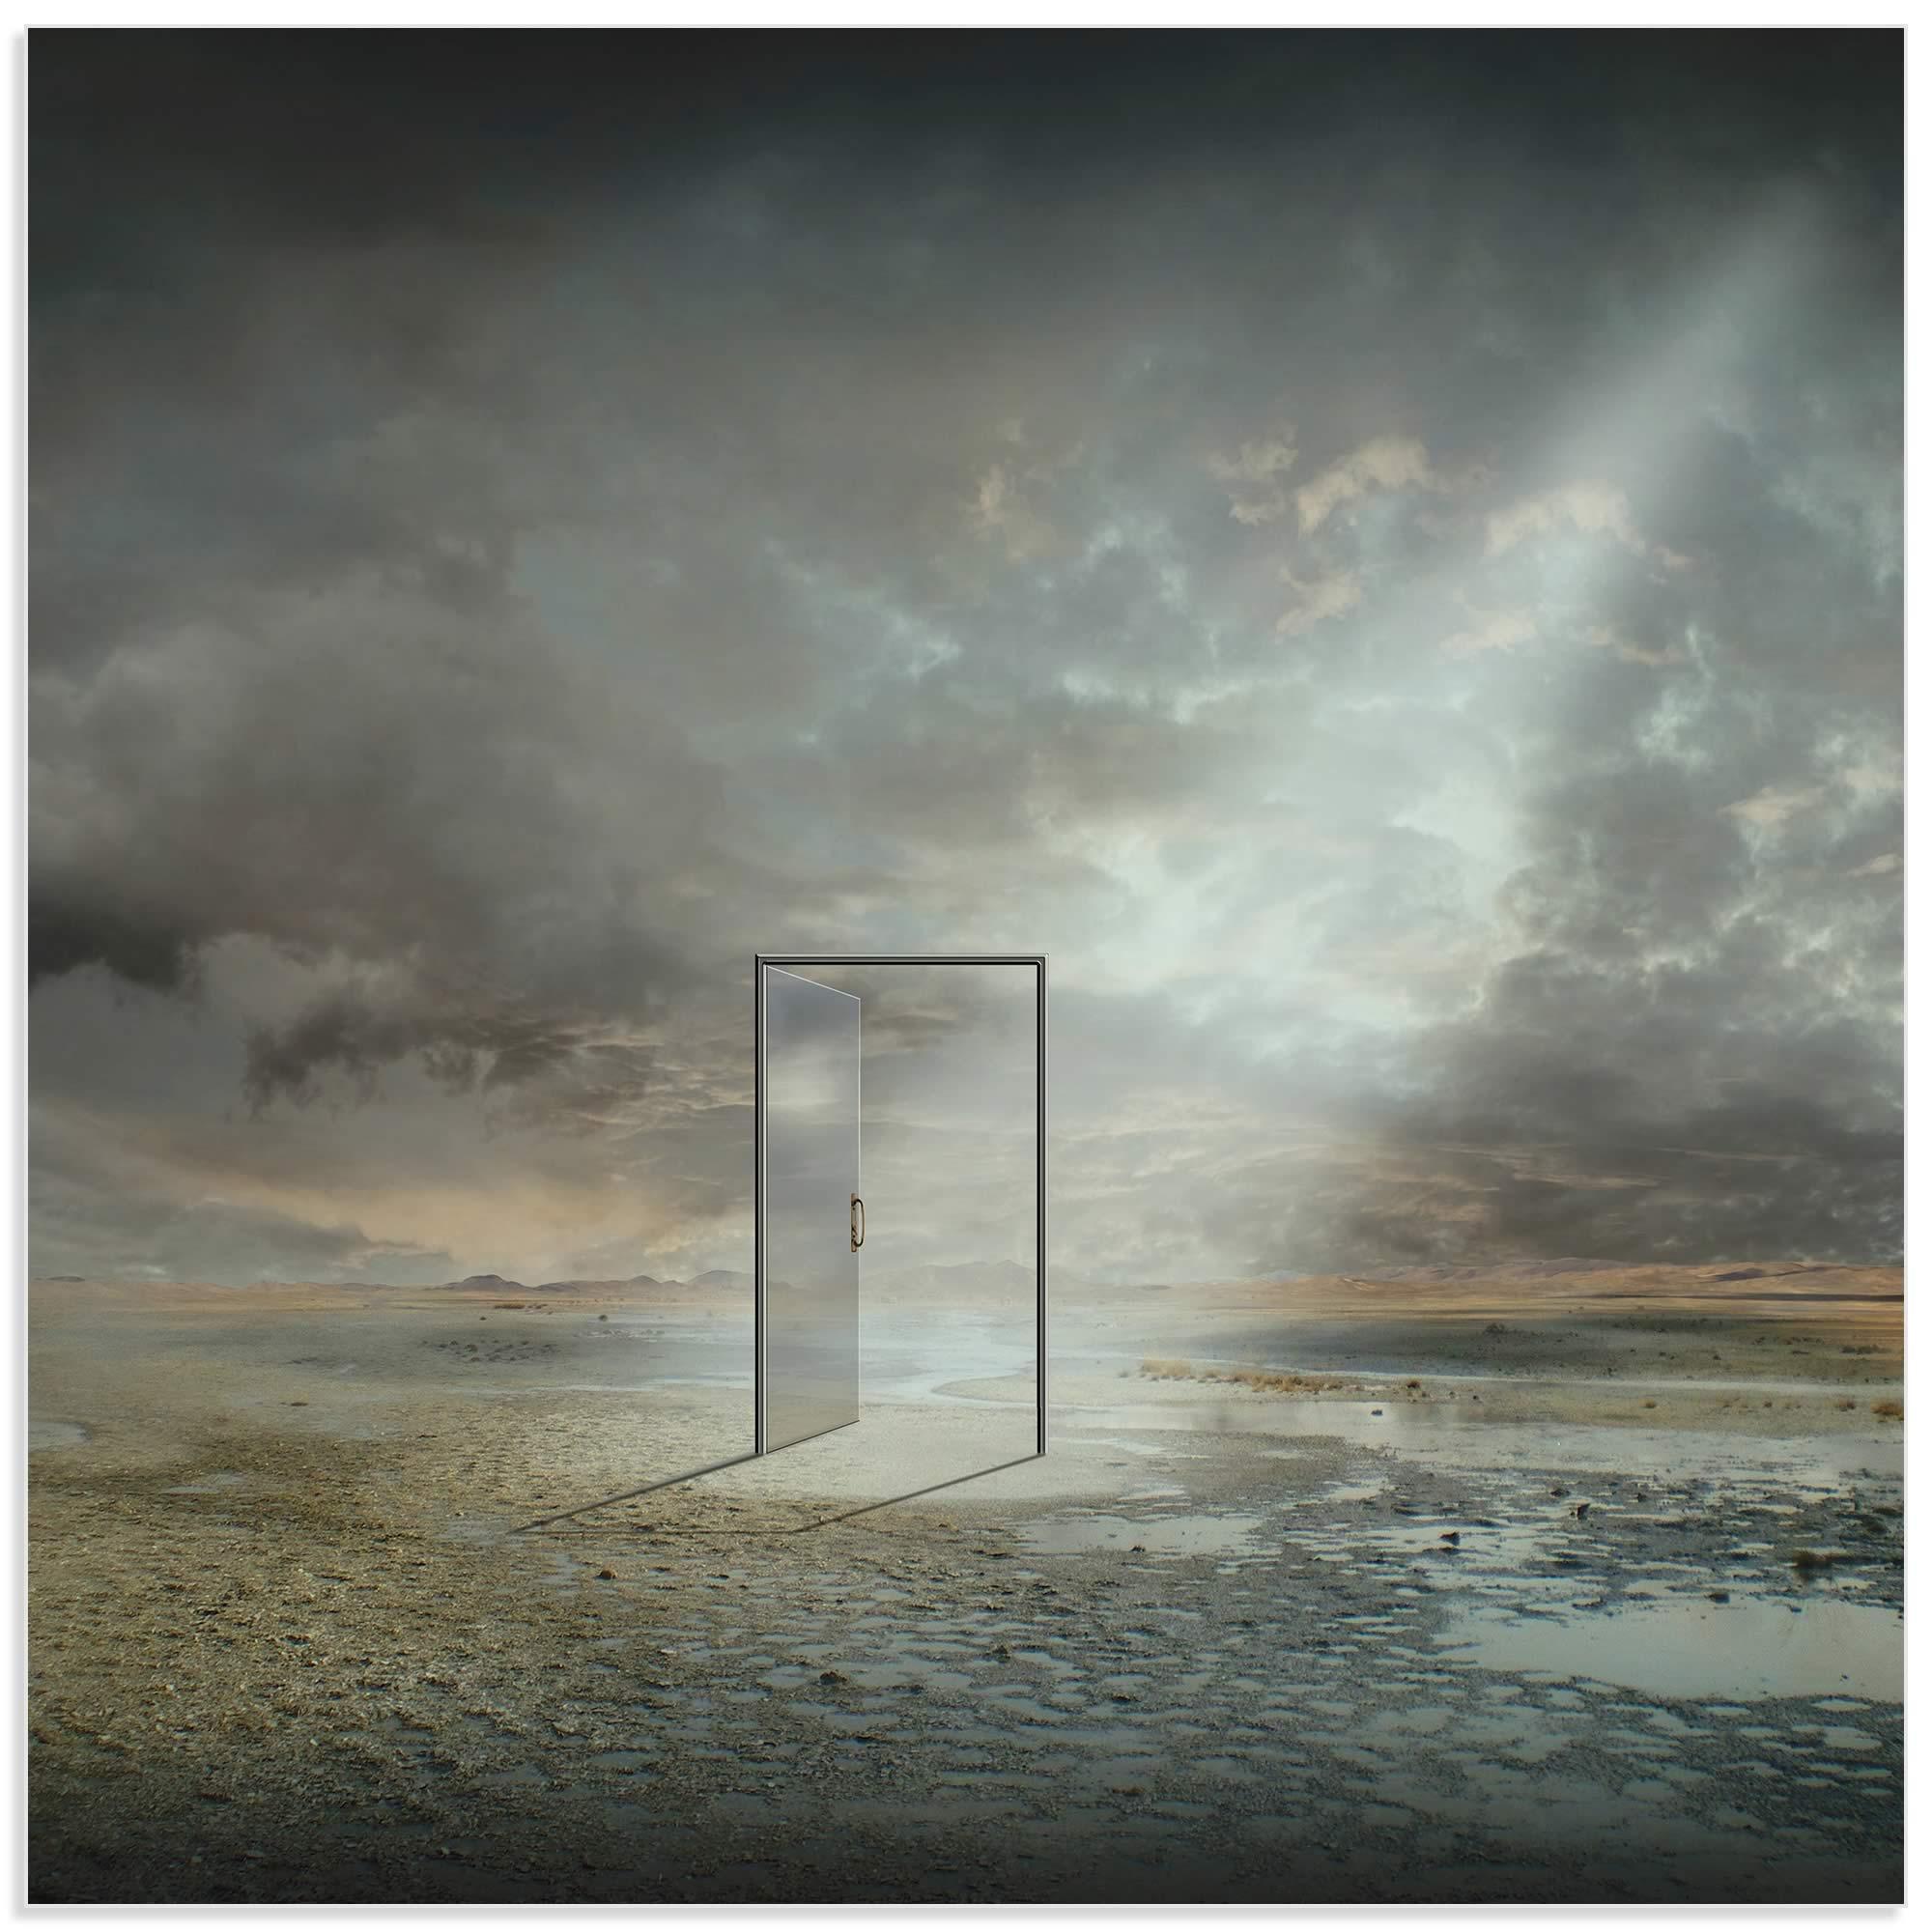 Behind Reality by Franziskus Pfleghart - Digital Art on Metal or Acrylic - Alternate View 2